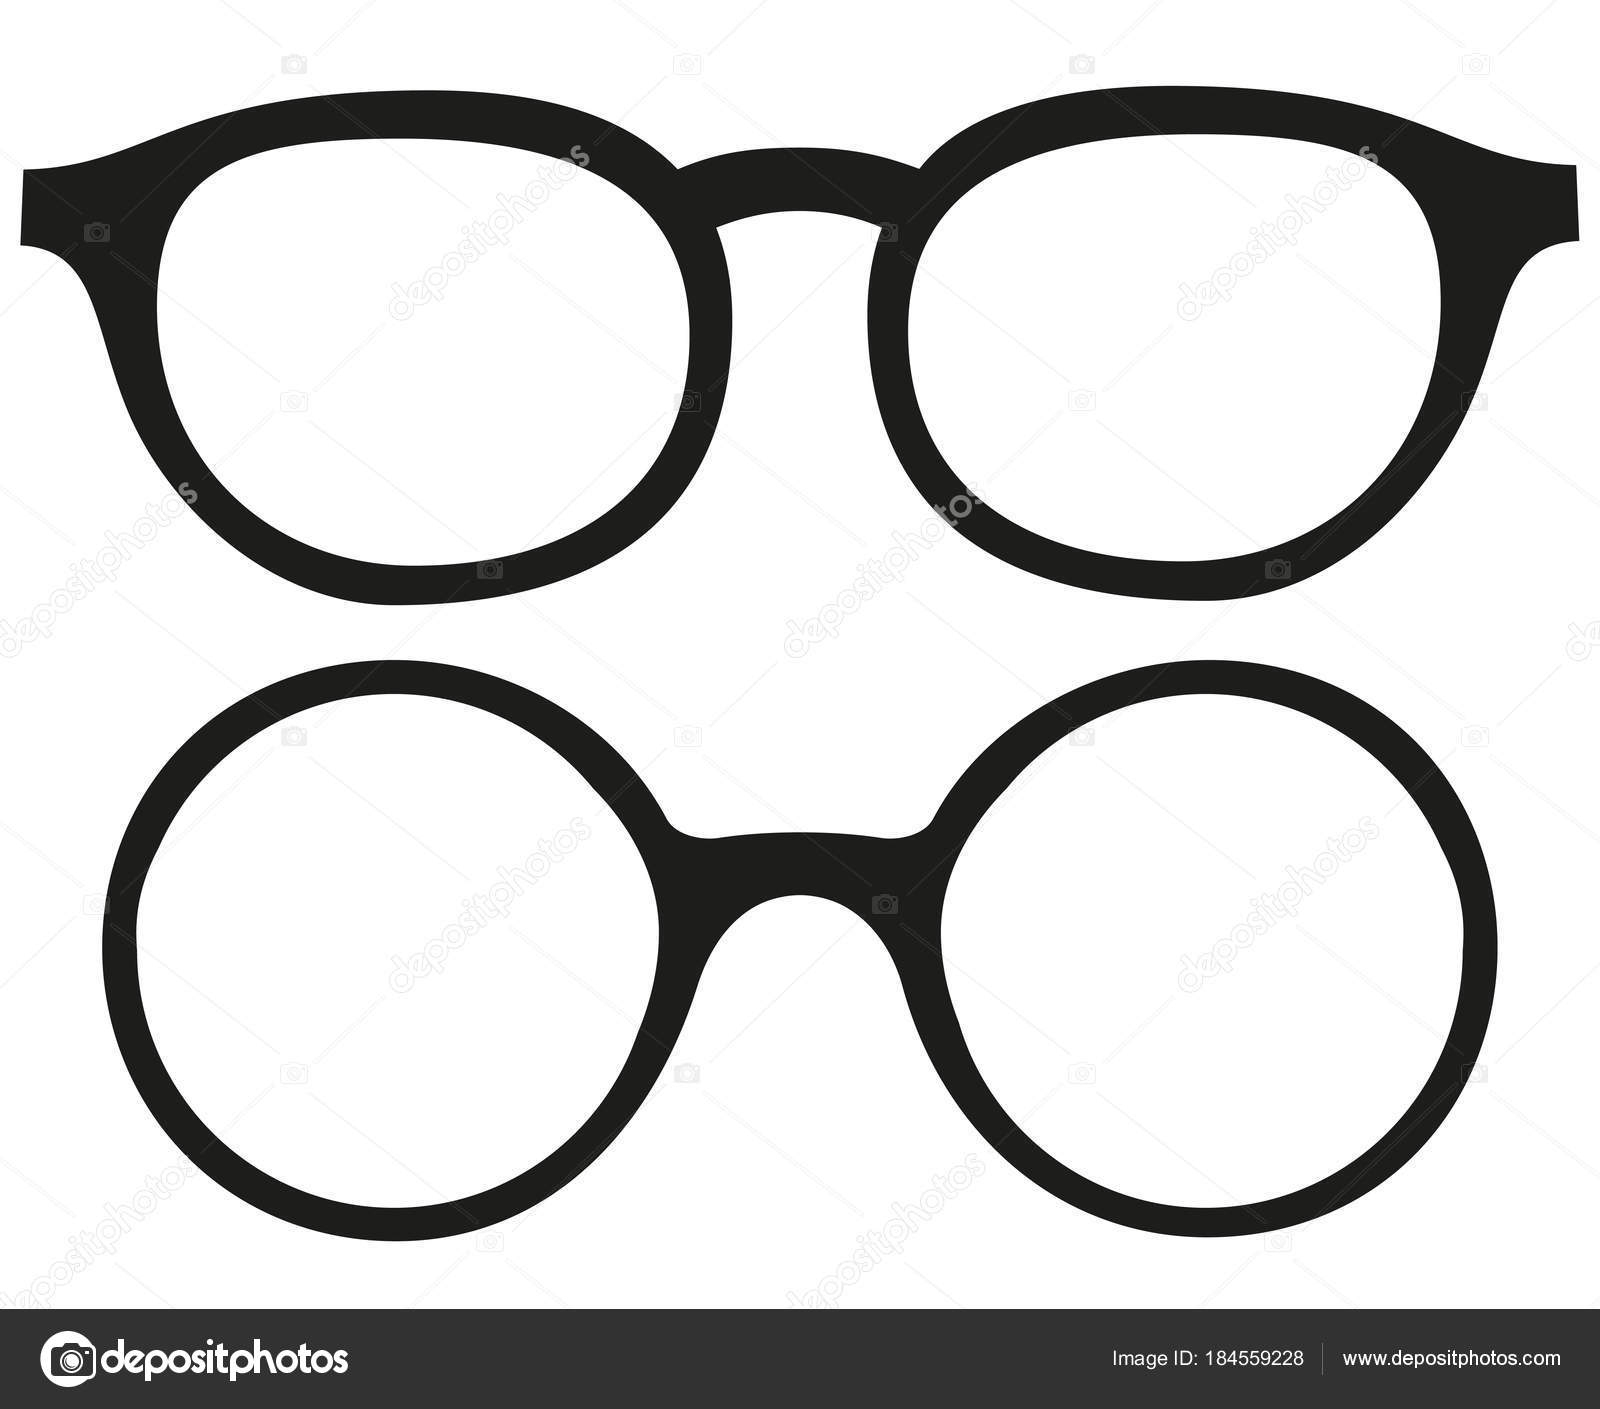 Cartoon Icona Poster Occhiali, Occhiali Silhouette Set tout Lunette Dessin